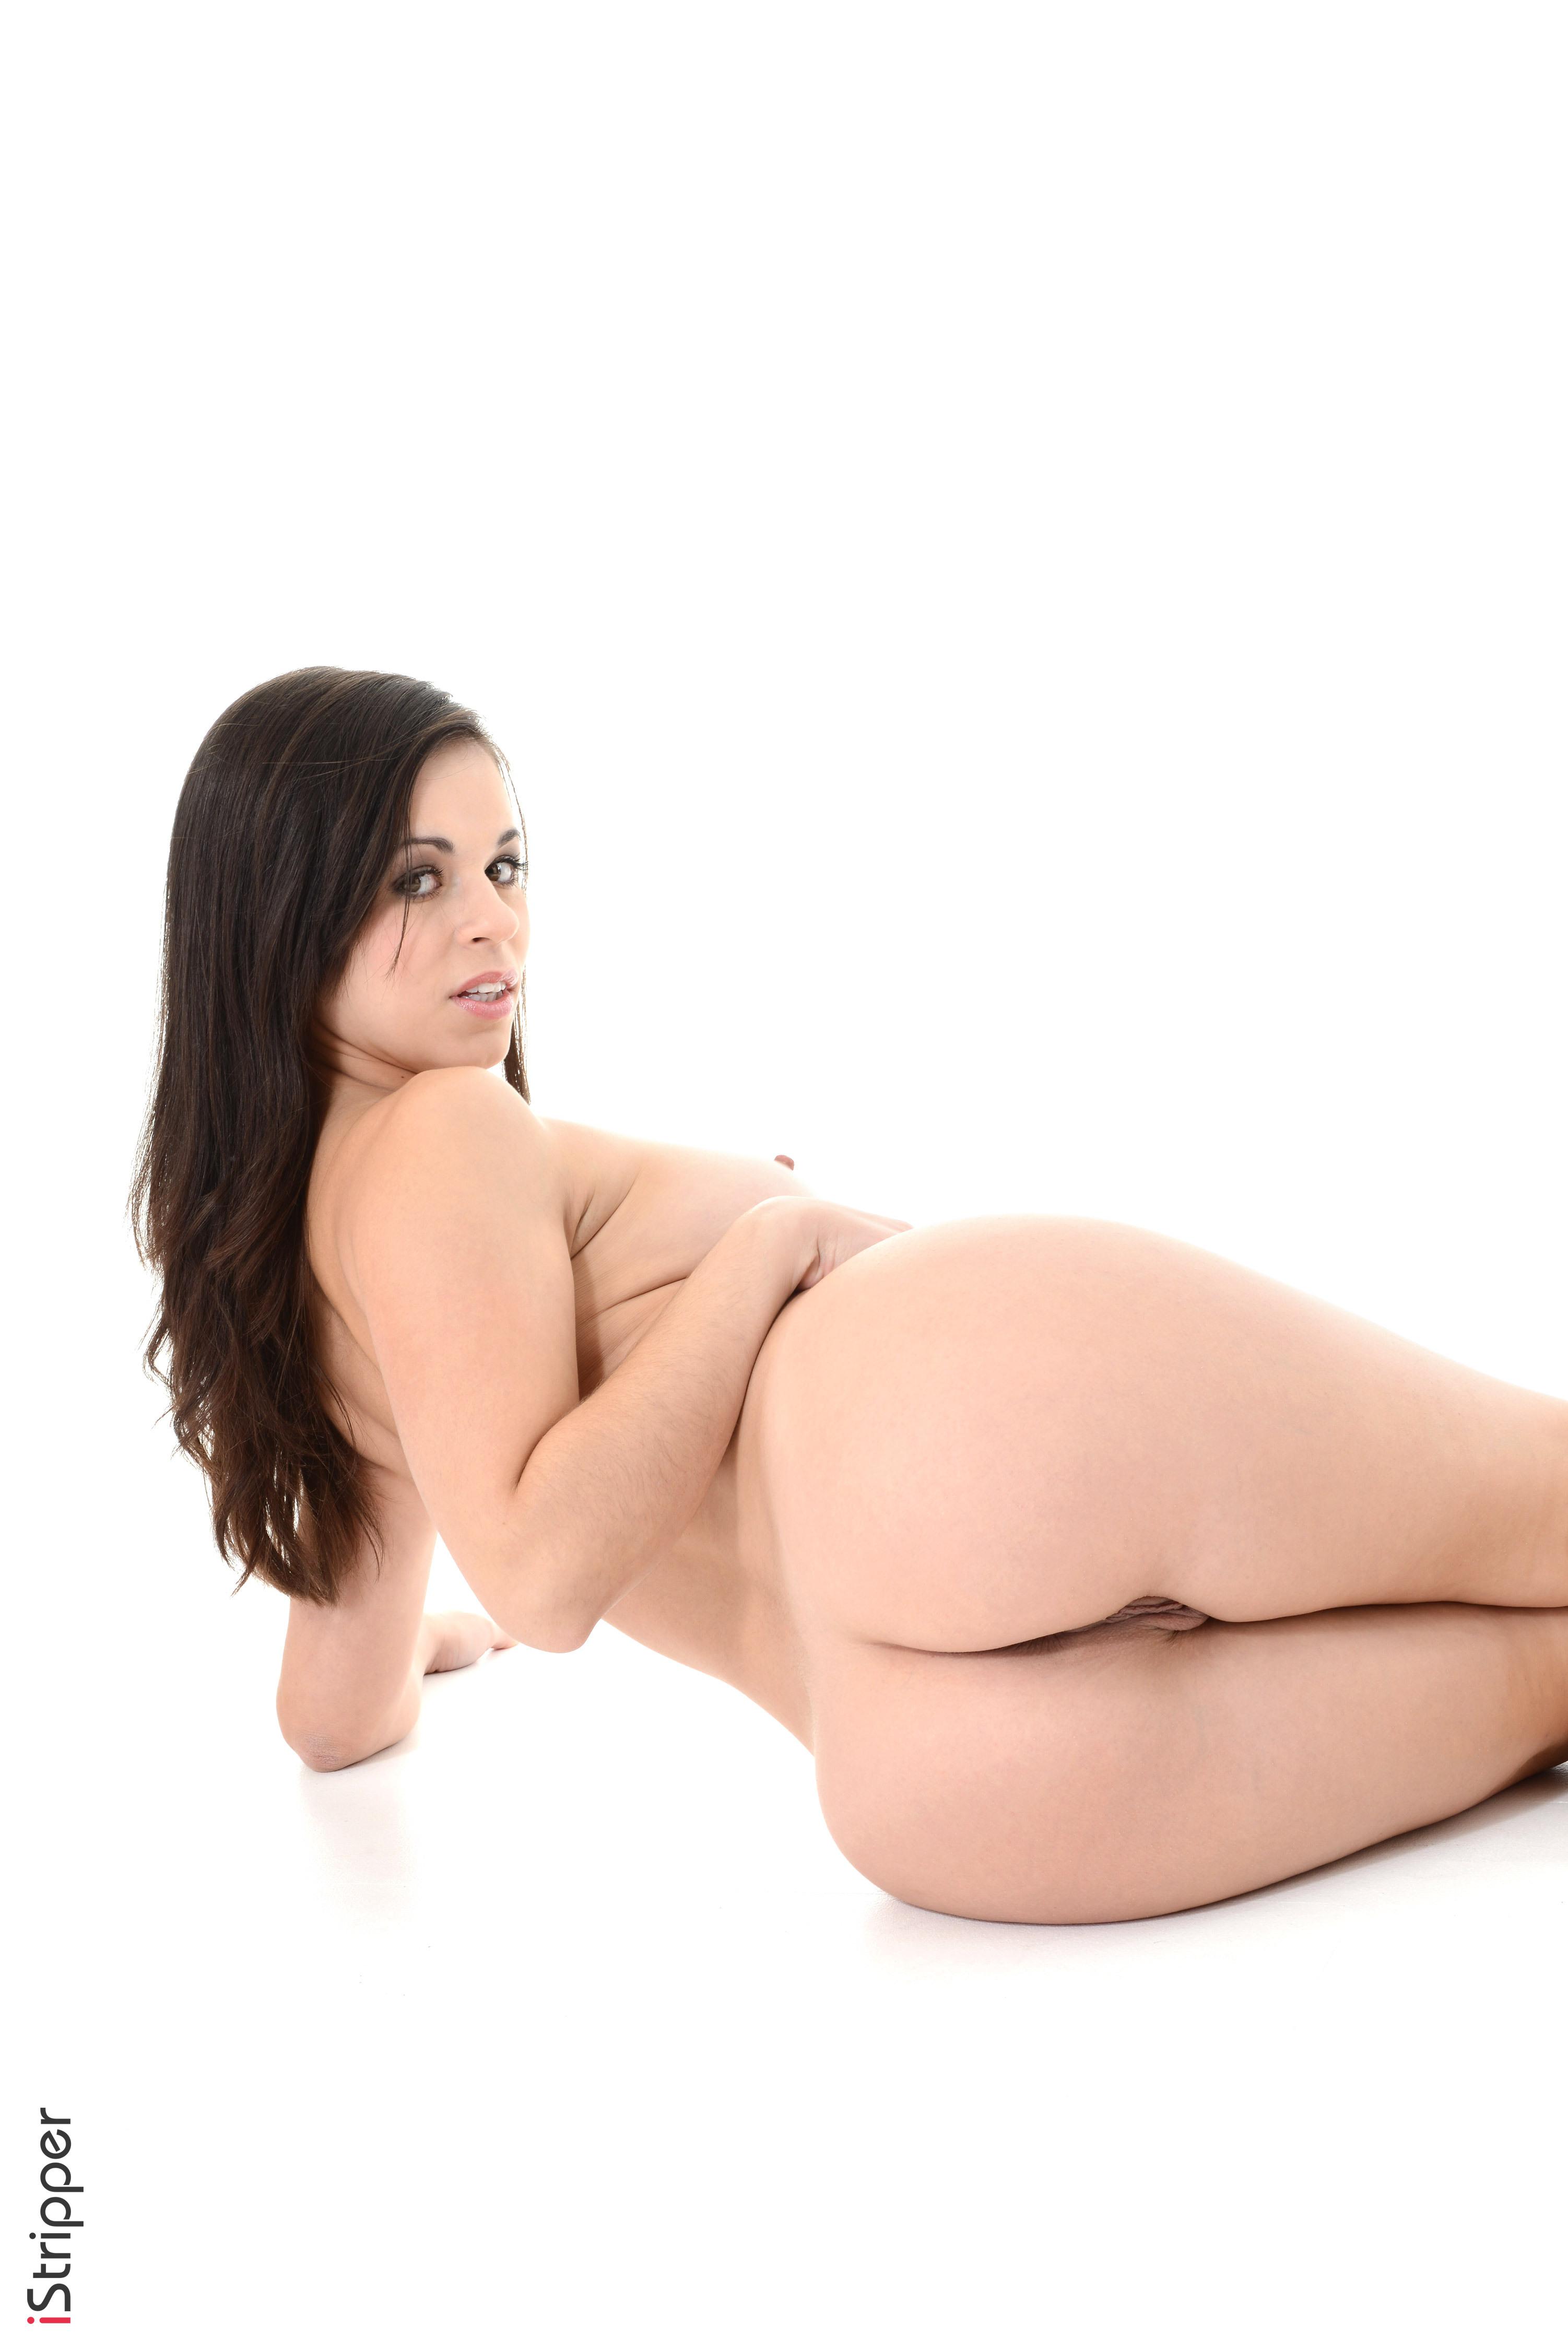 edison chen complete sex pictures